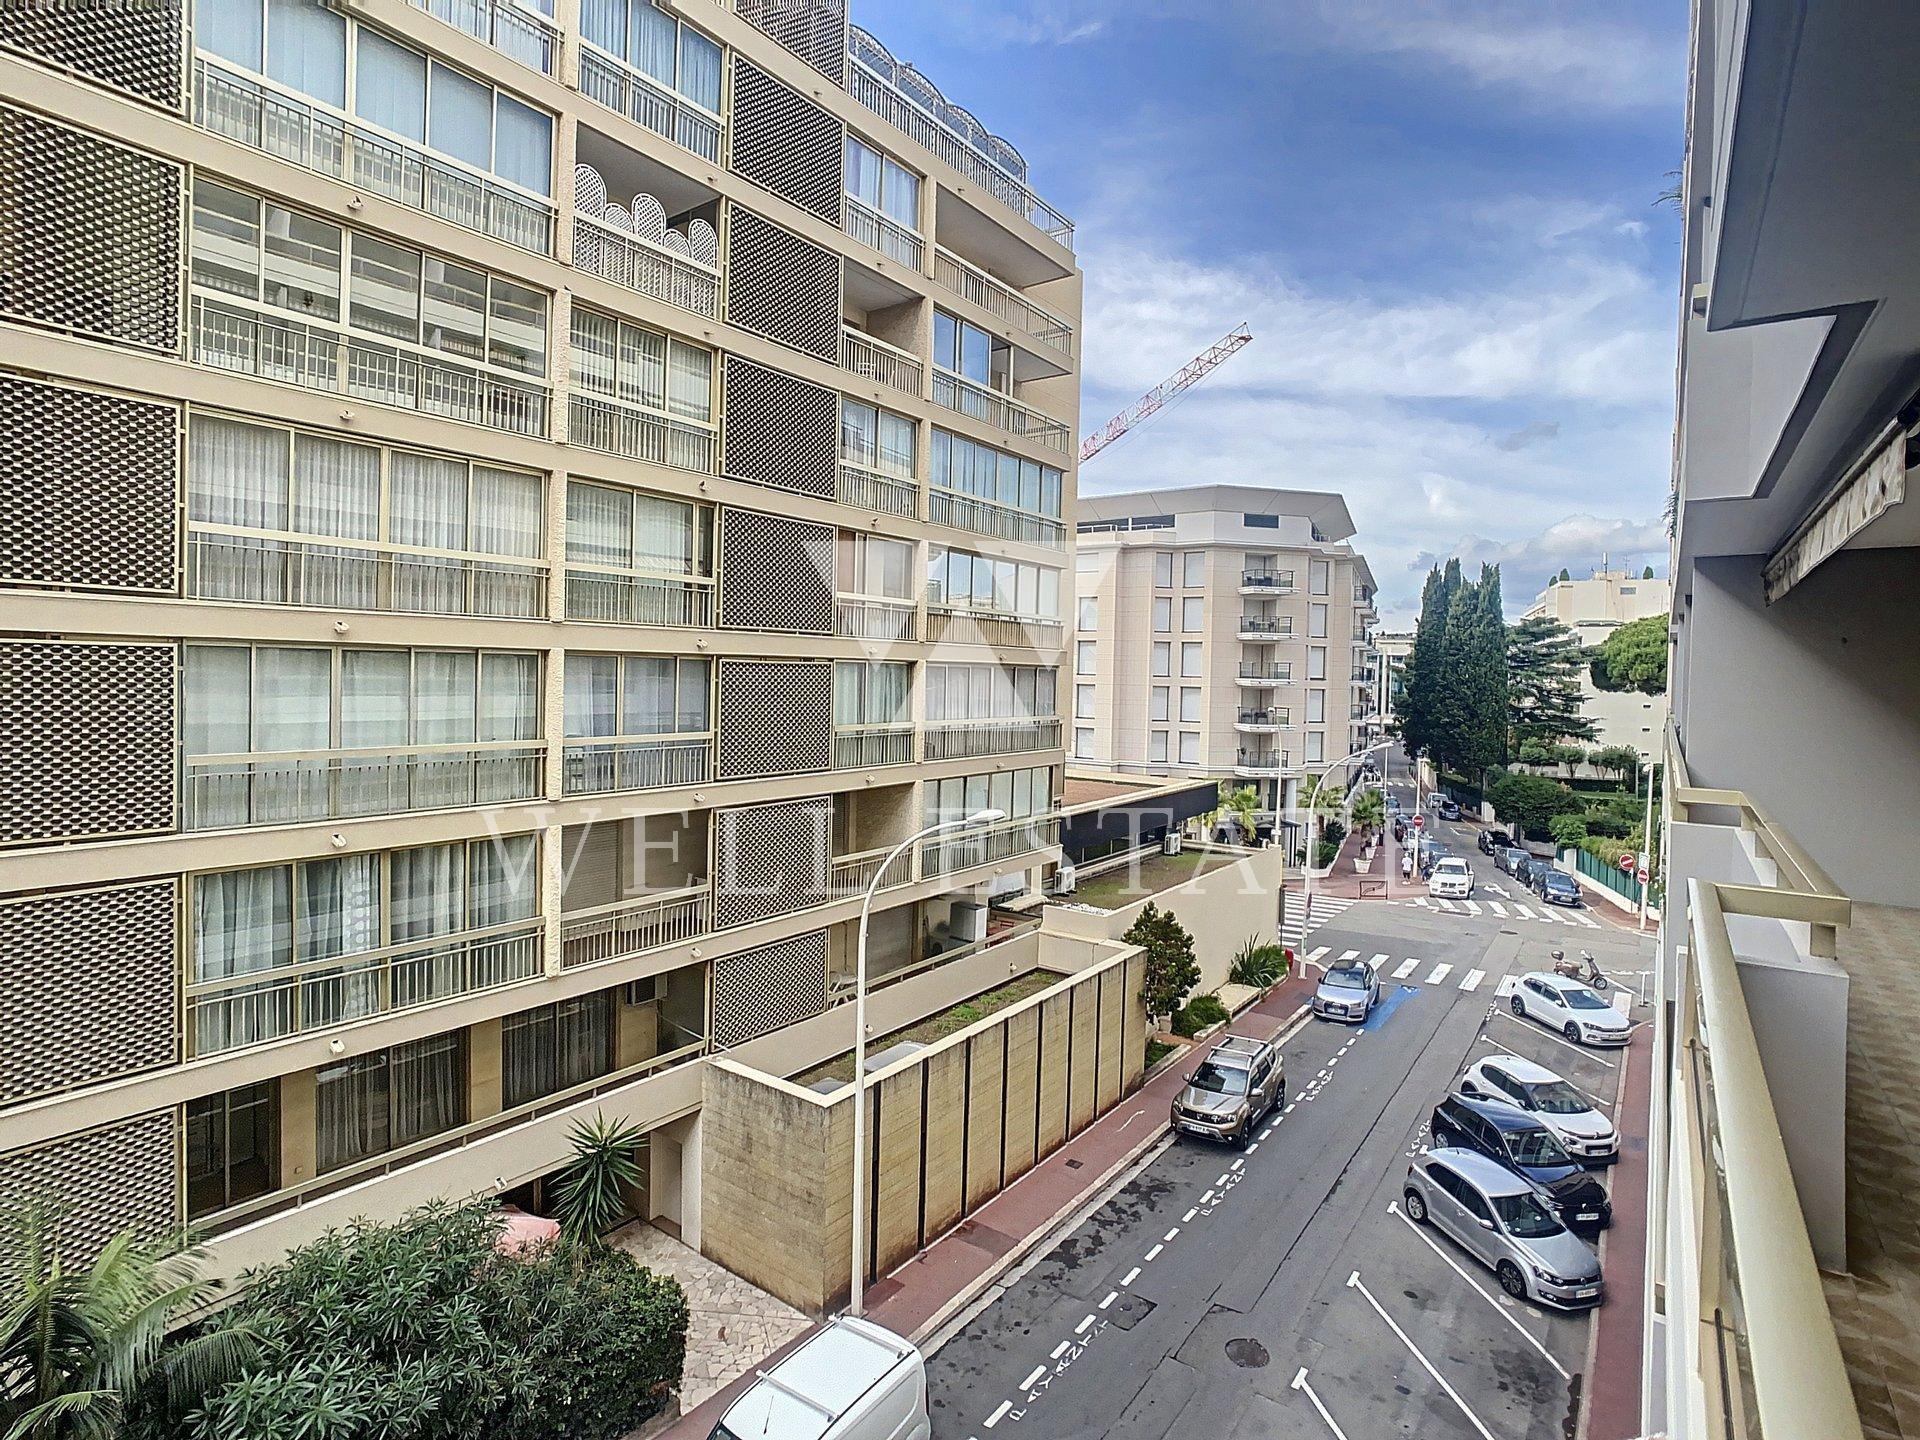 Канны центр 3-х комнатная квартира 80м2 с террасами и балконами